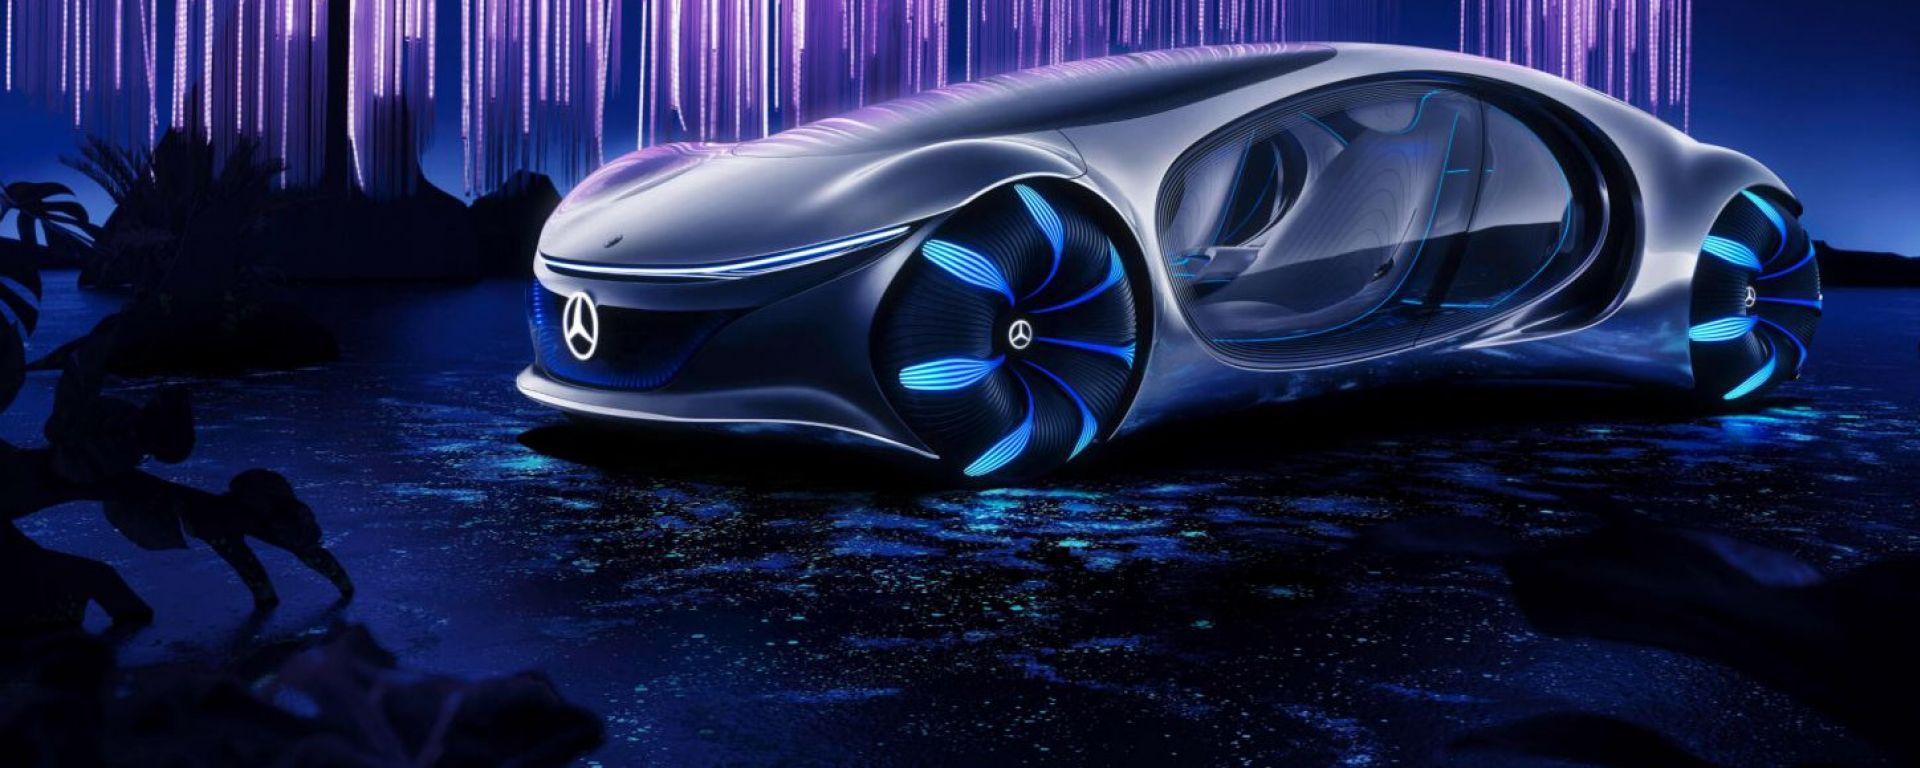 Mercedes-Benz Vision AVTR al CES 2020